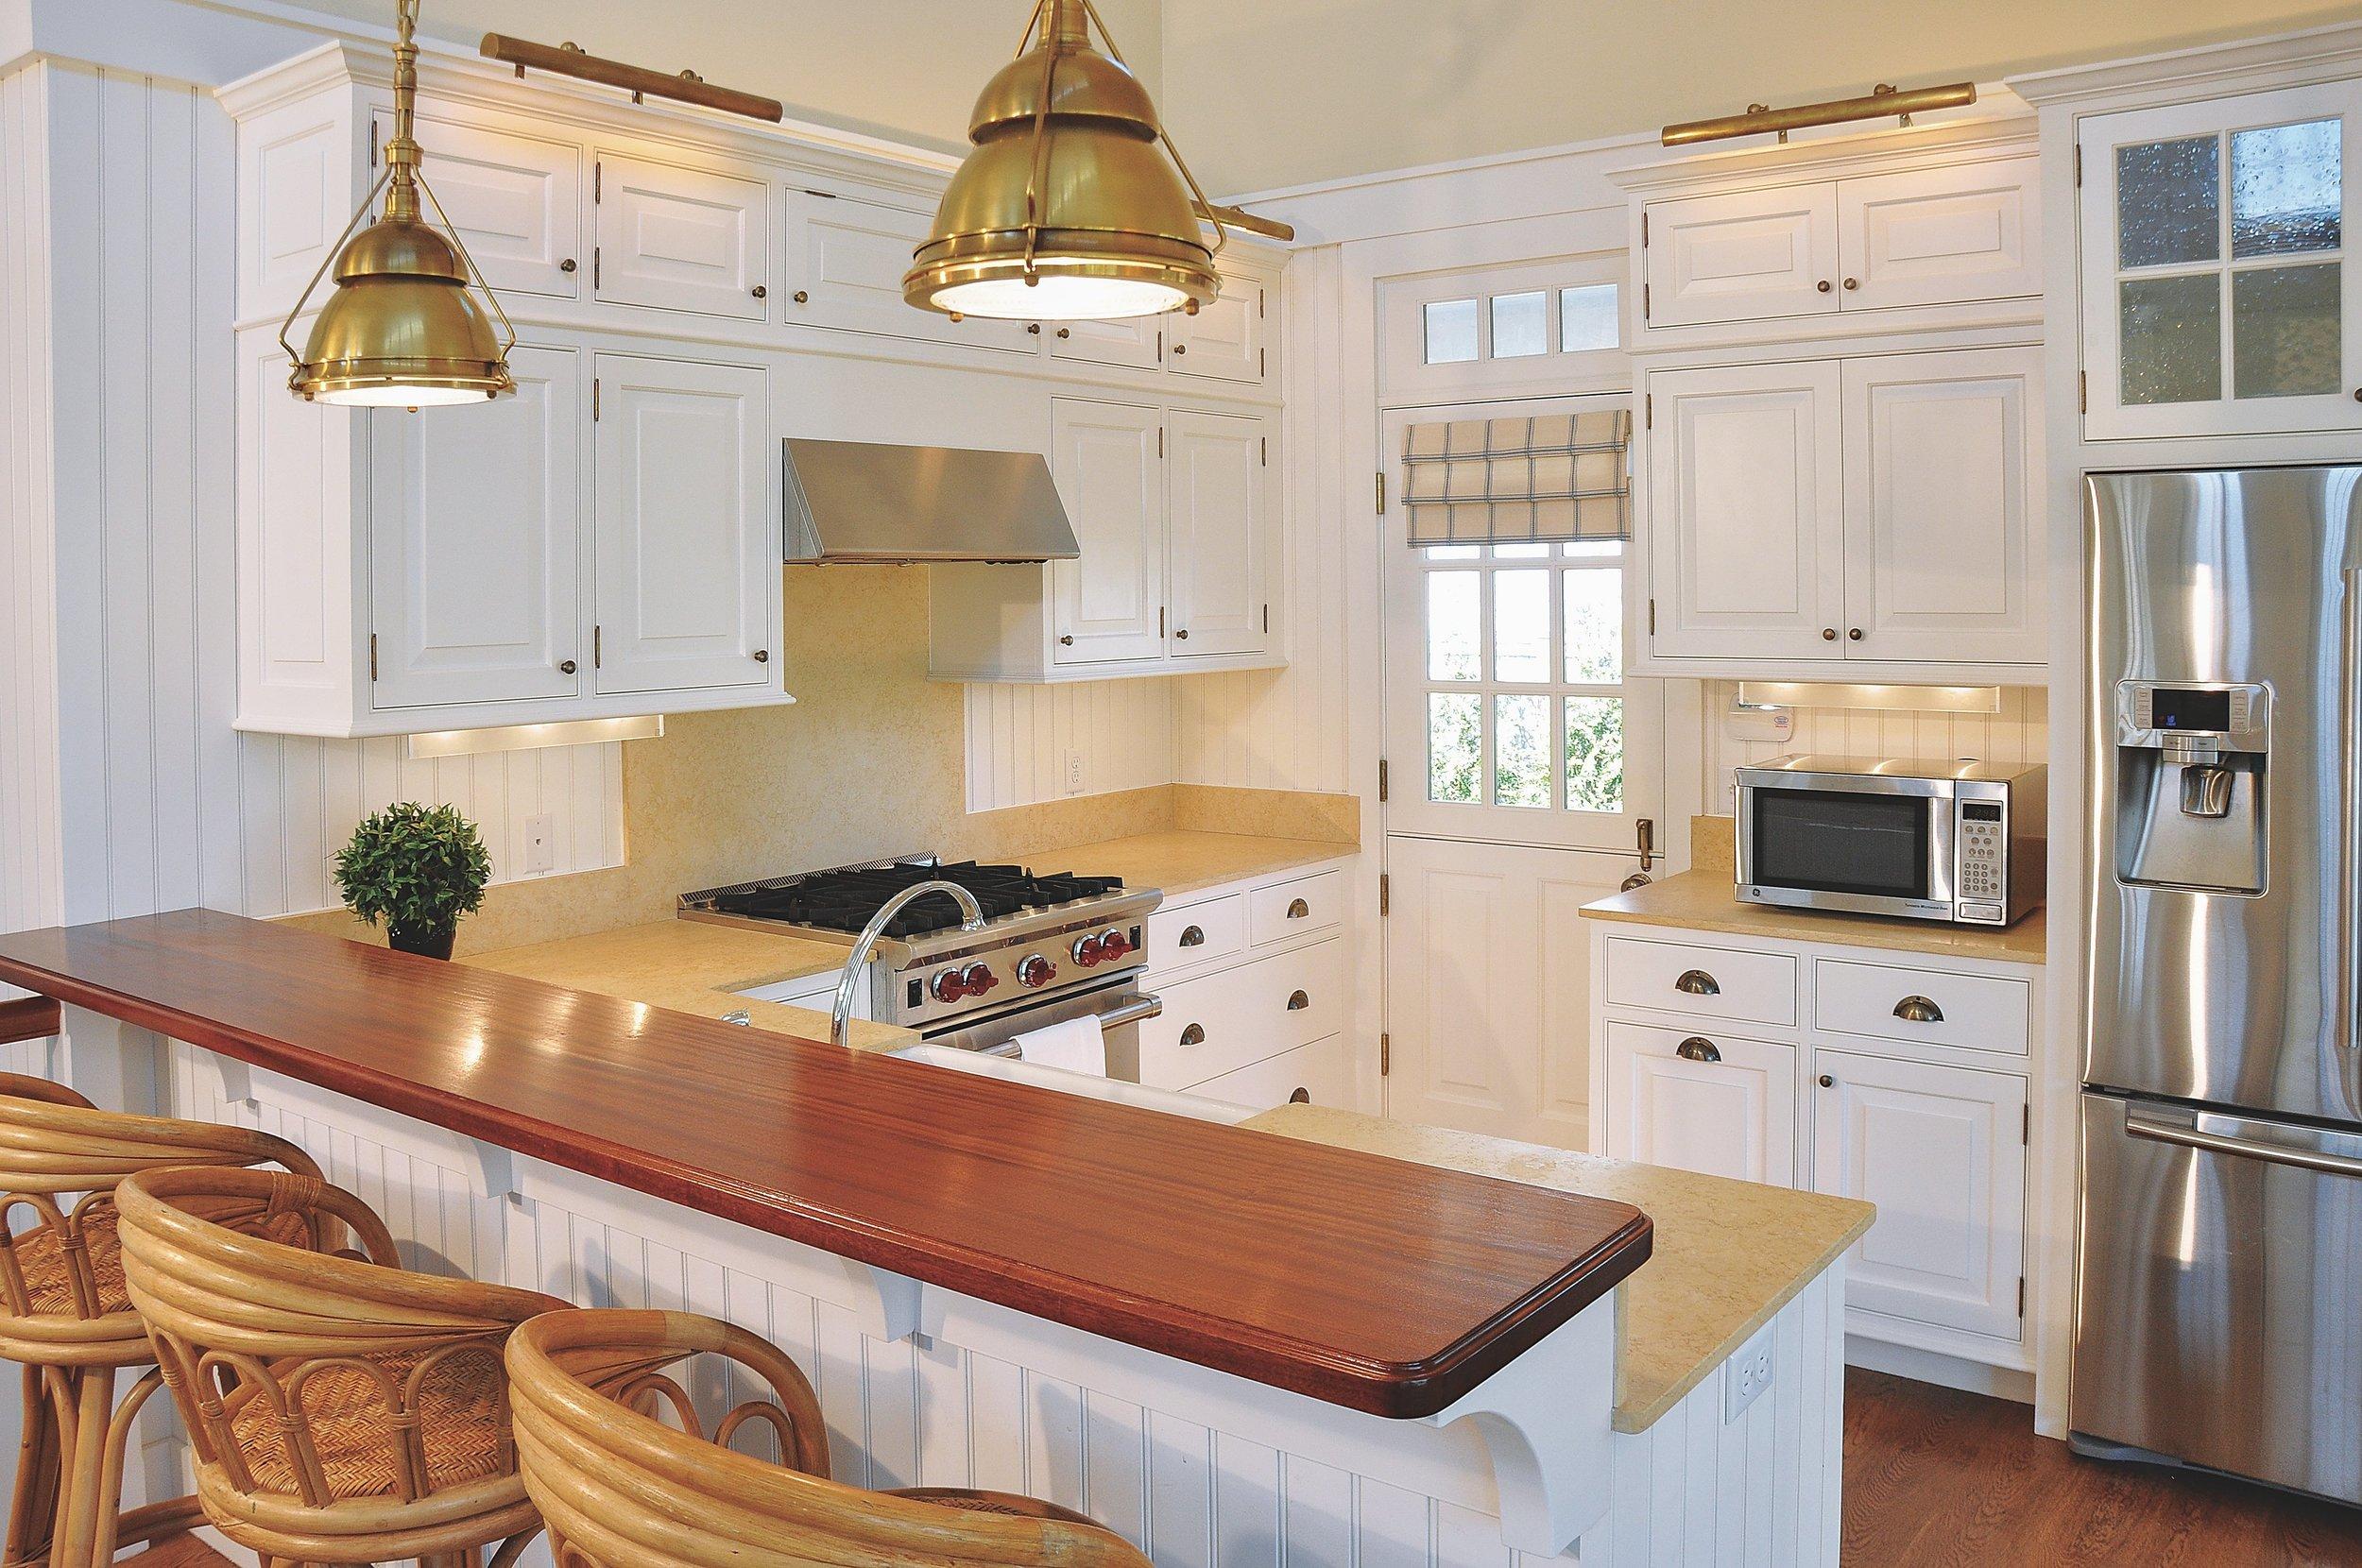 Modern_Farmhouse_Kitchen_Brass_Pendant_Industrial_Chandelier.jpg